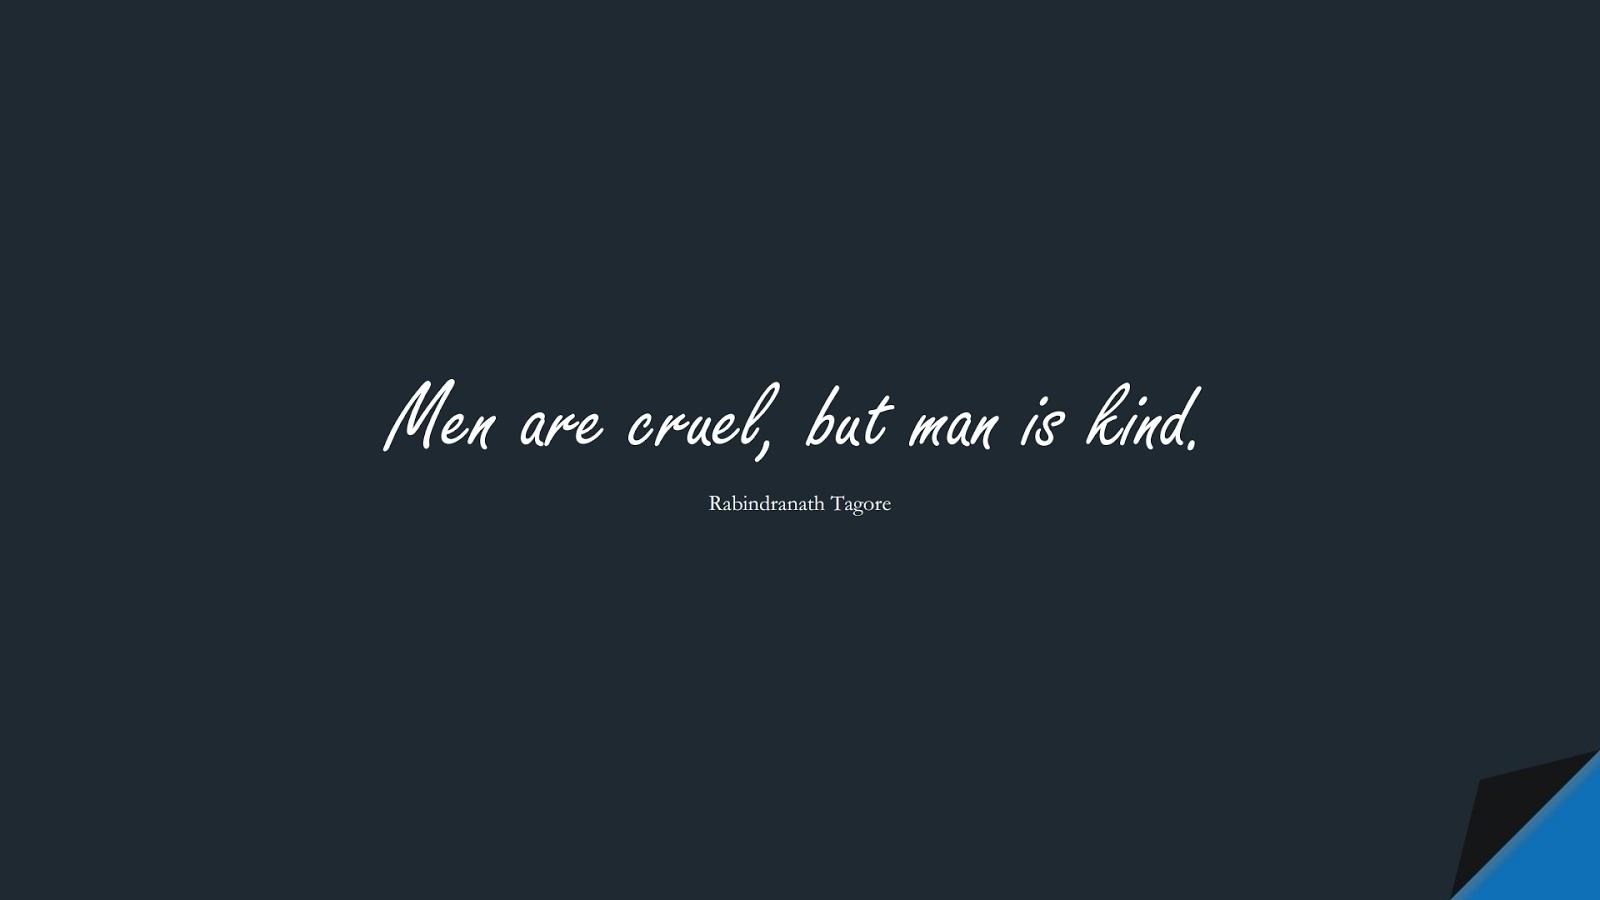 Men are cruel, but man is kind. (Rabindranath Tagore);  #HumanityQuotes